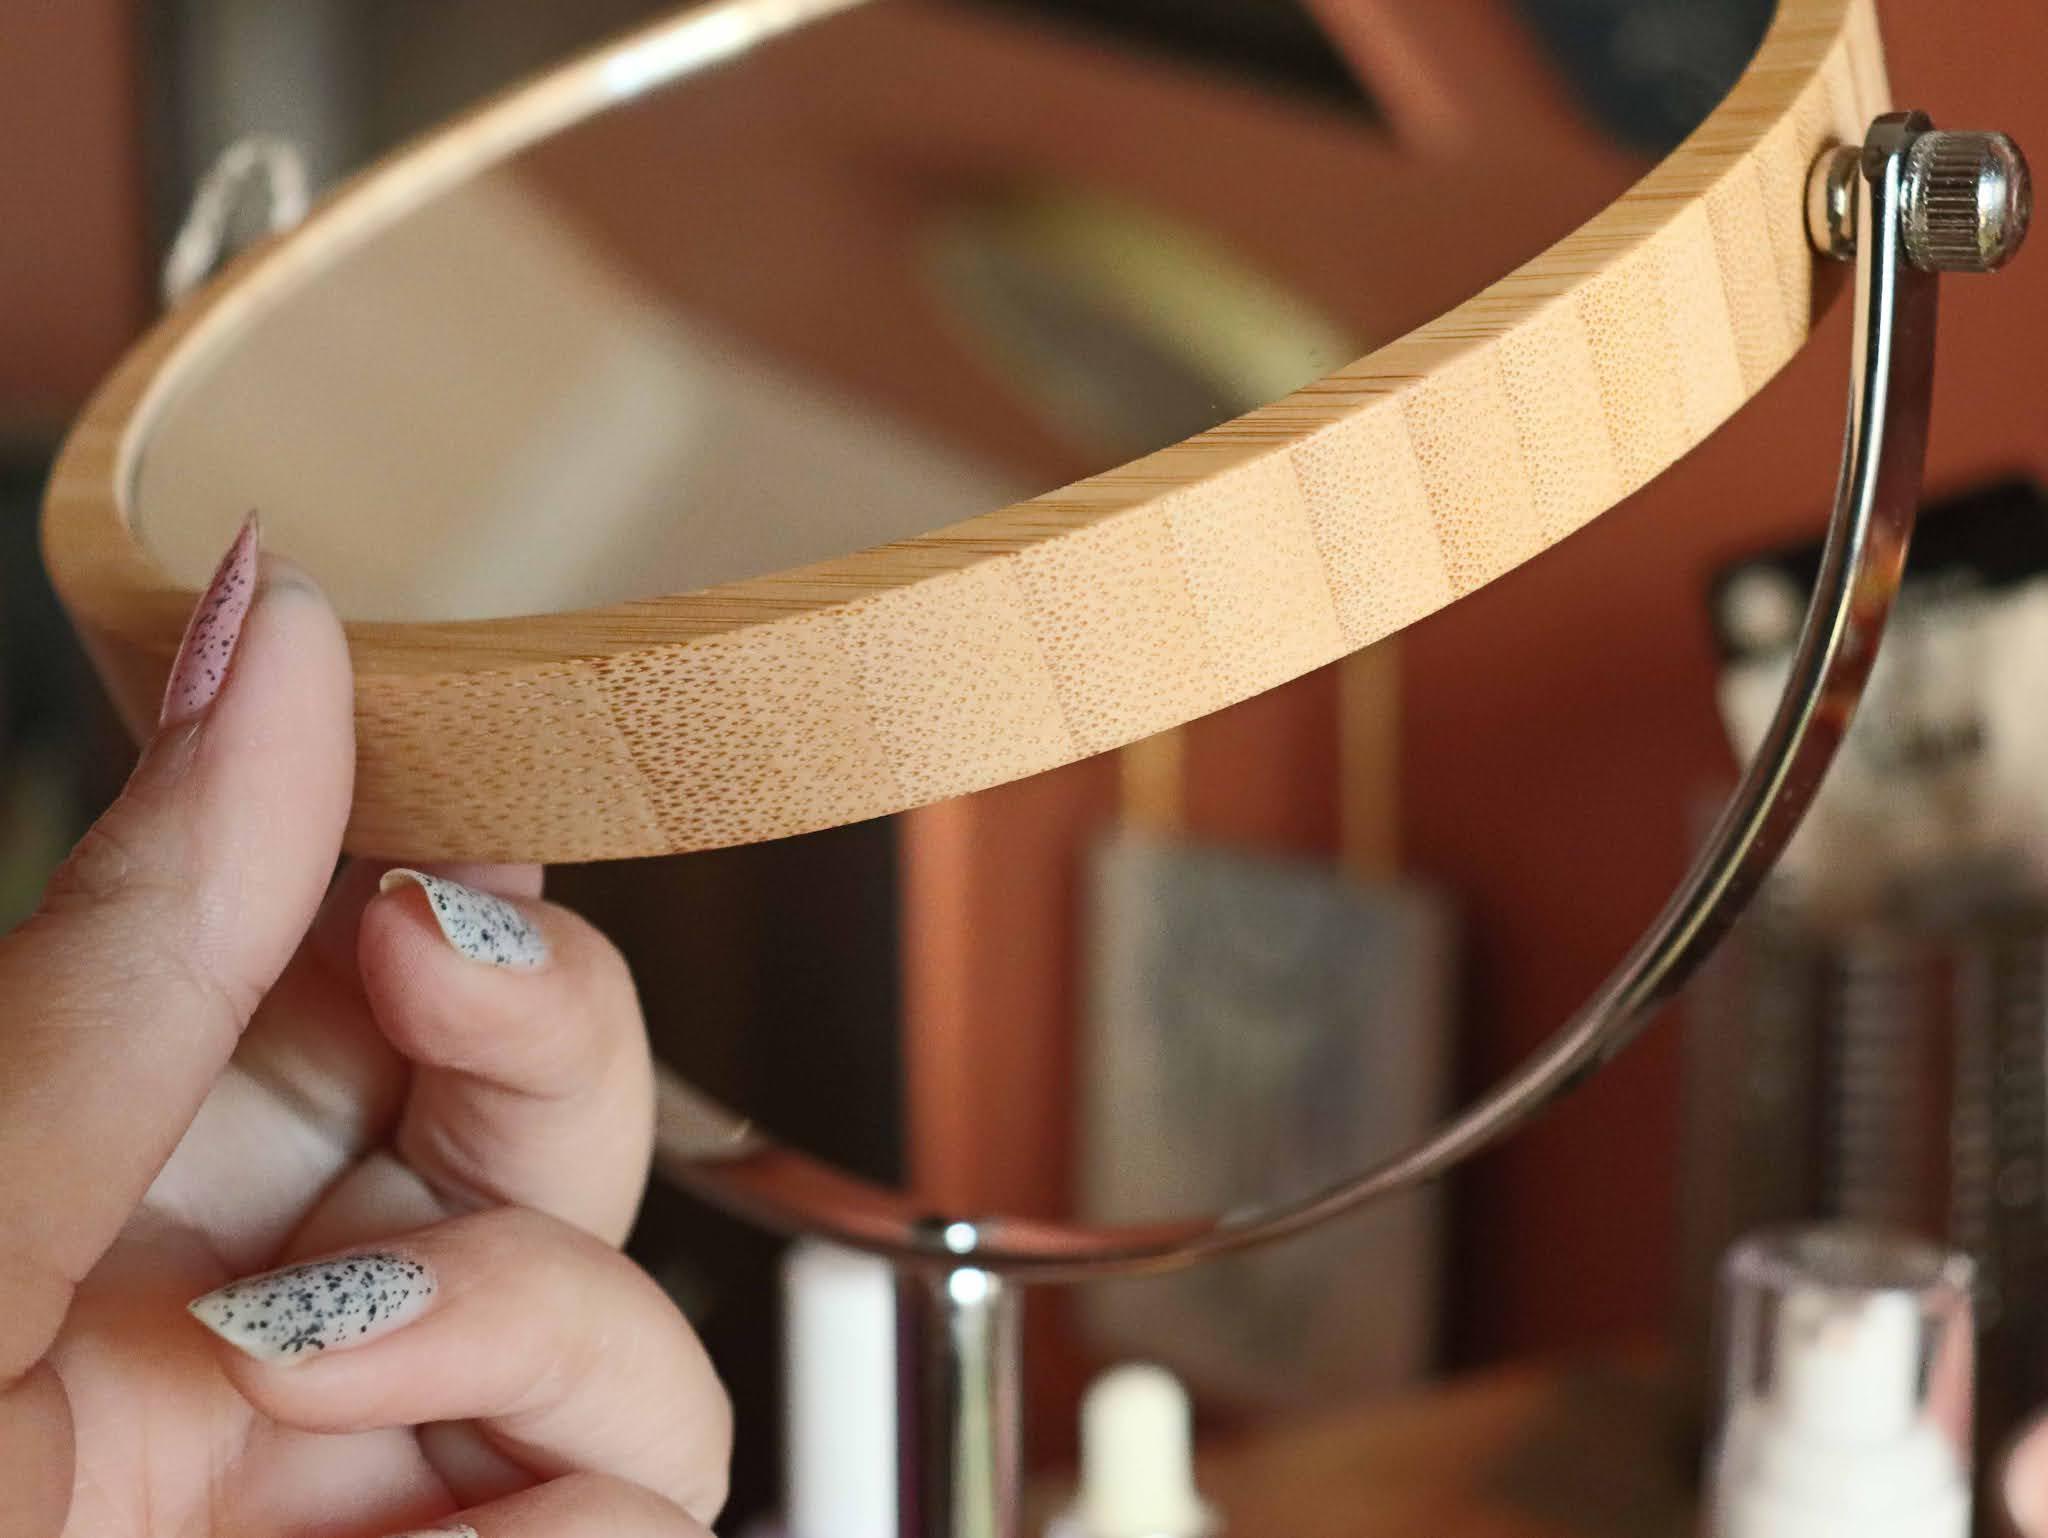 Best Makeup Eco-friendly Mirror - Home Centre